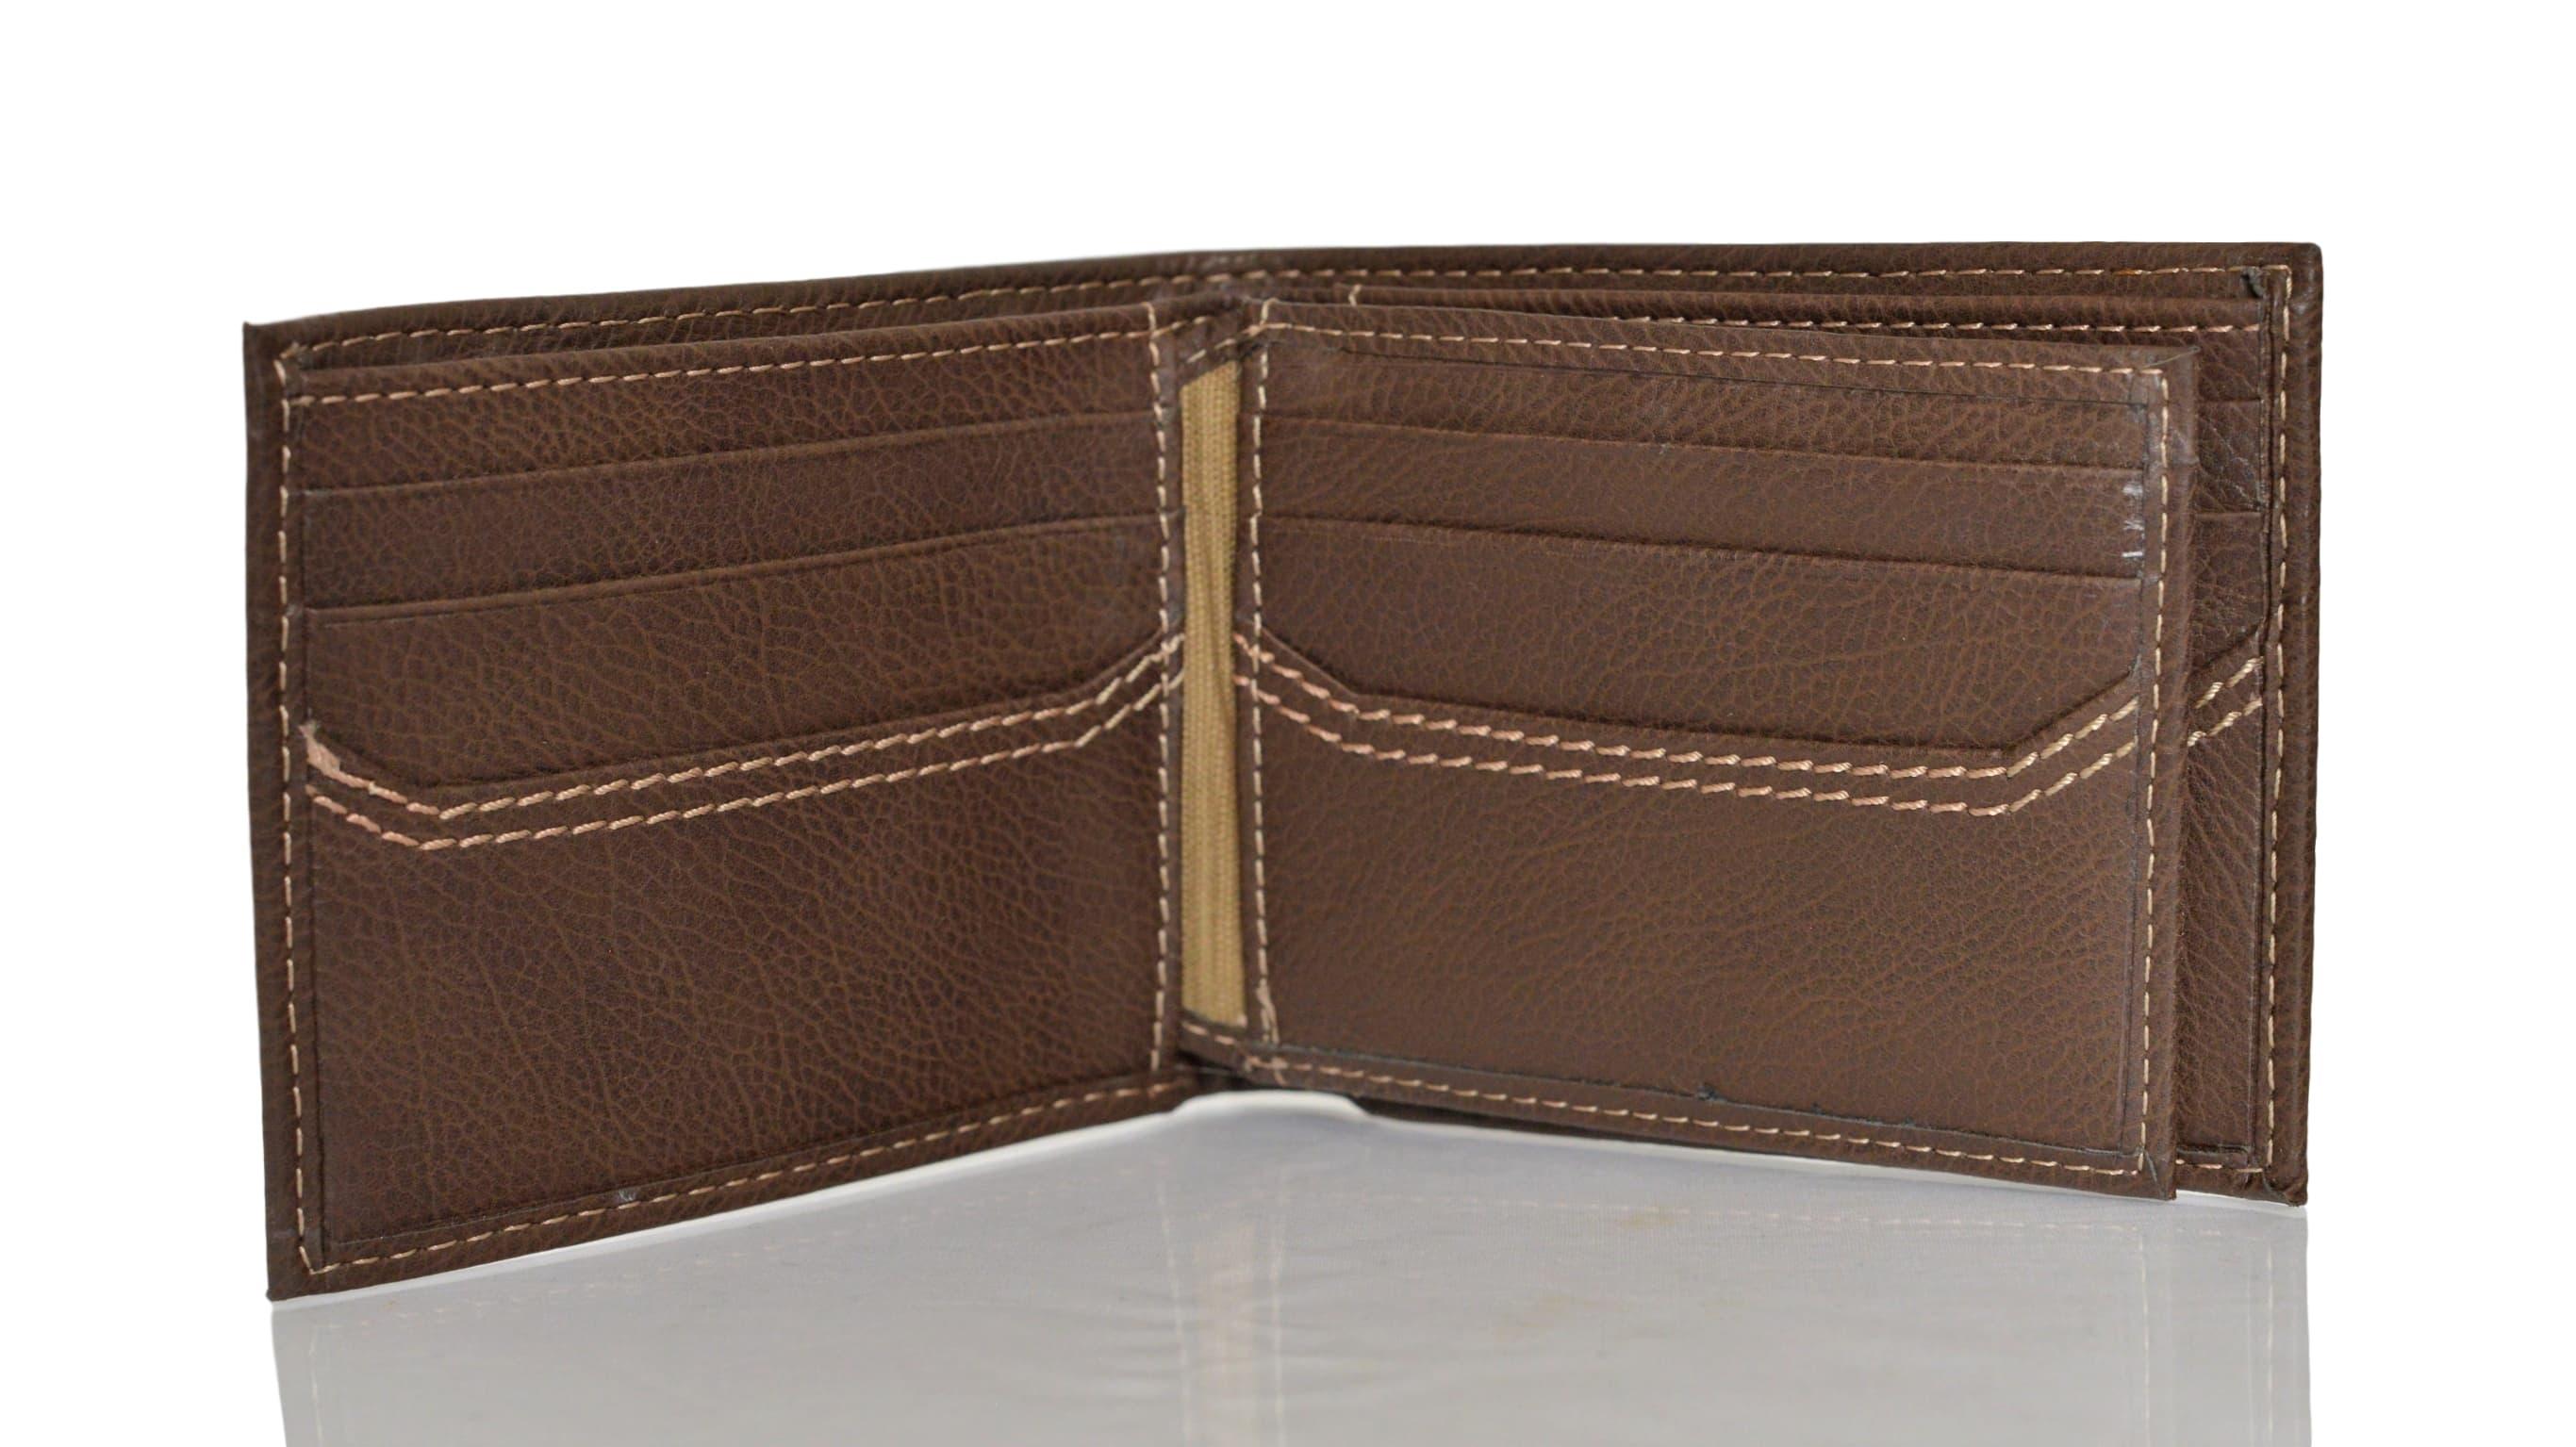 Levi-039-s-X-Capacity-Slim-Men-039-s-Bifold-Leather-Wallet thumbnail 13